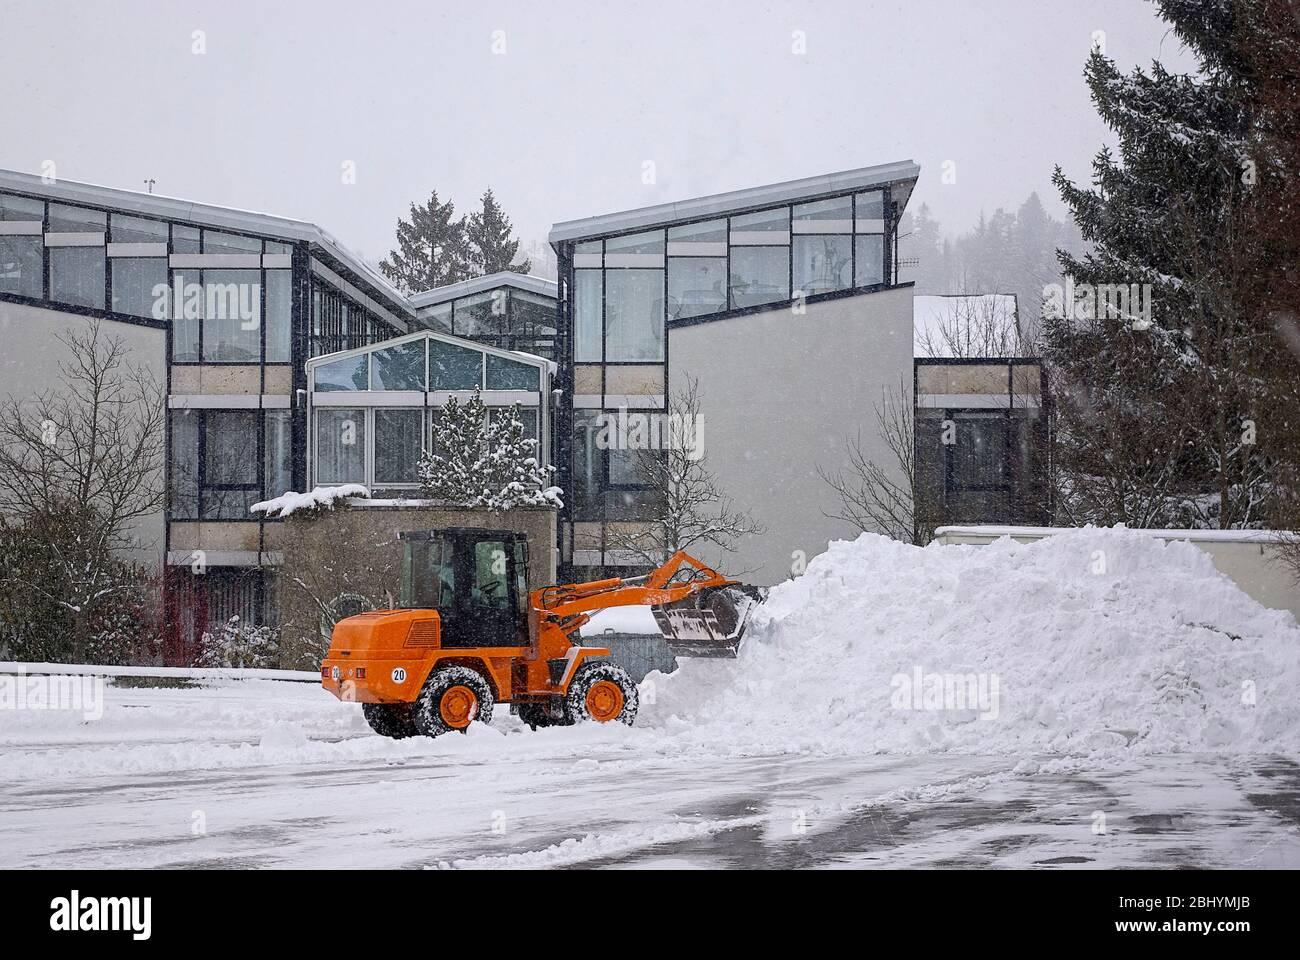 Radlader räumt Schnee. Stockfoto